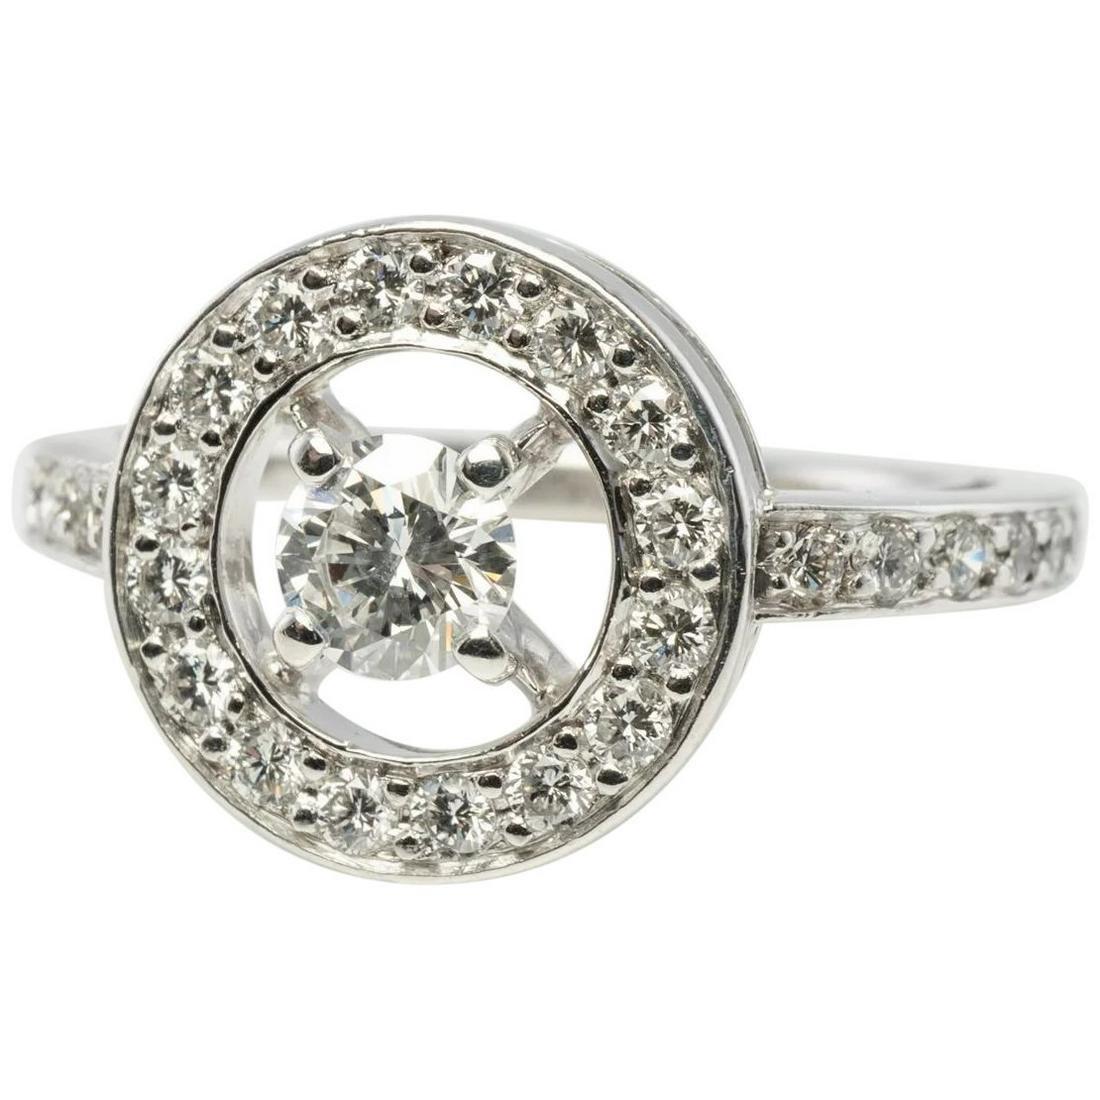 Boucheron Diamond Ring PRG29652 sz 50 18K White Gold